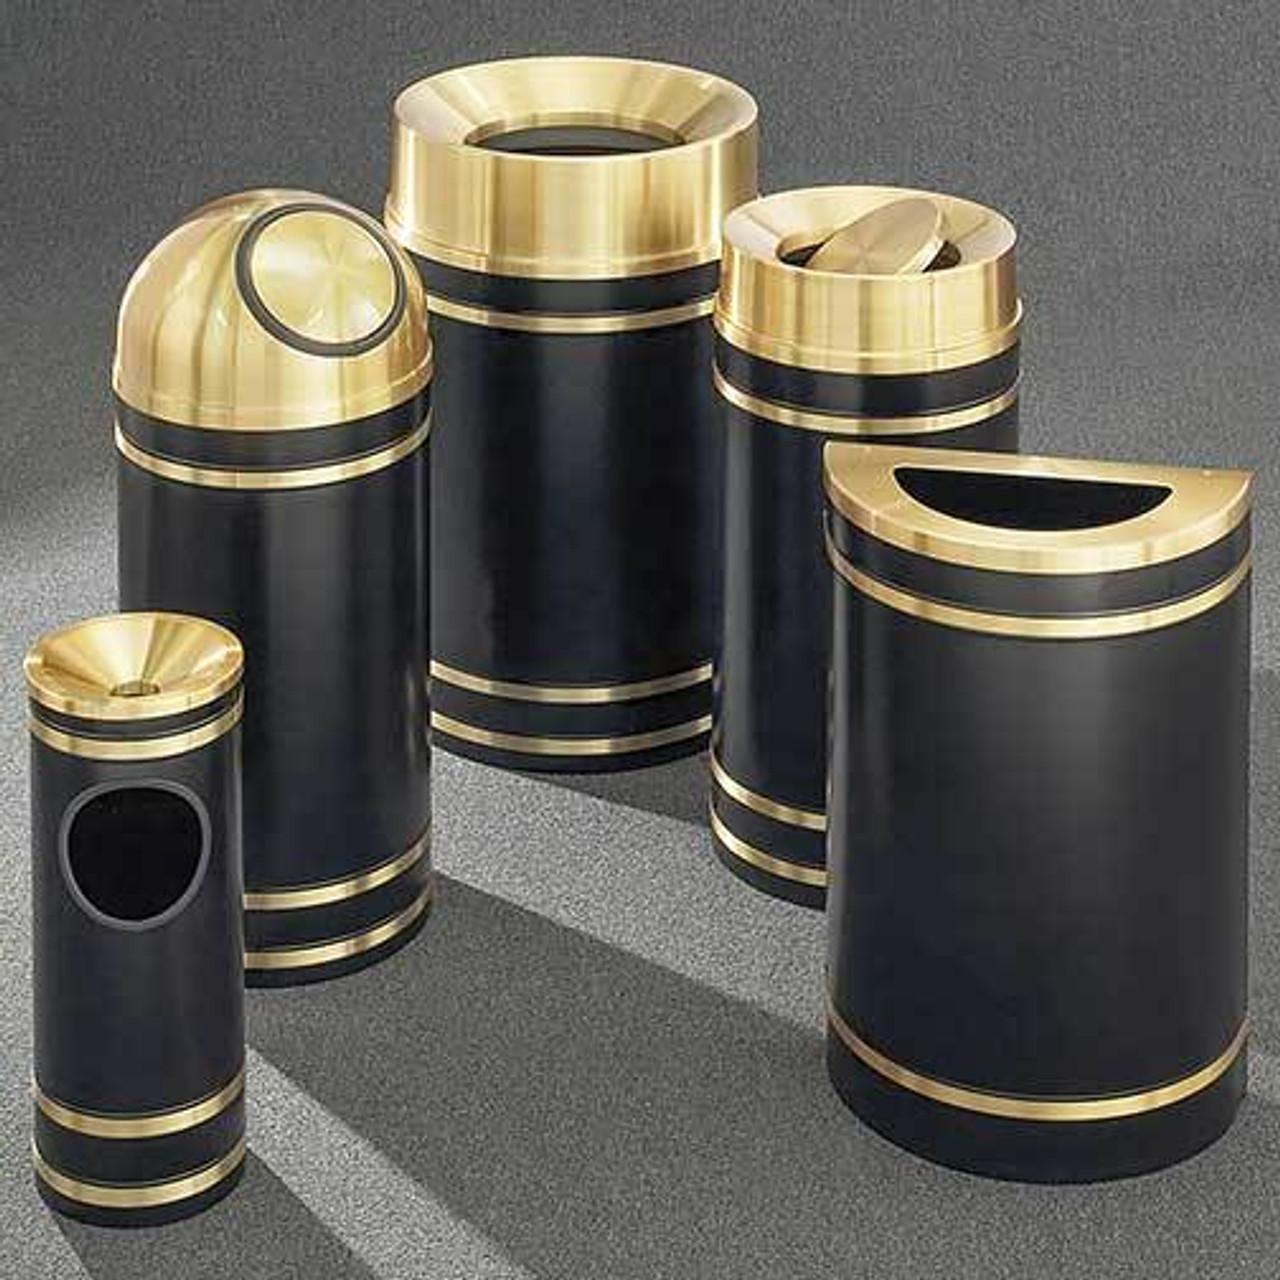 Glaro Monte Carlo Trash Cans - Satin Brass